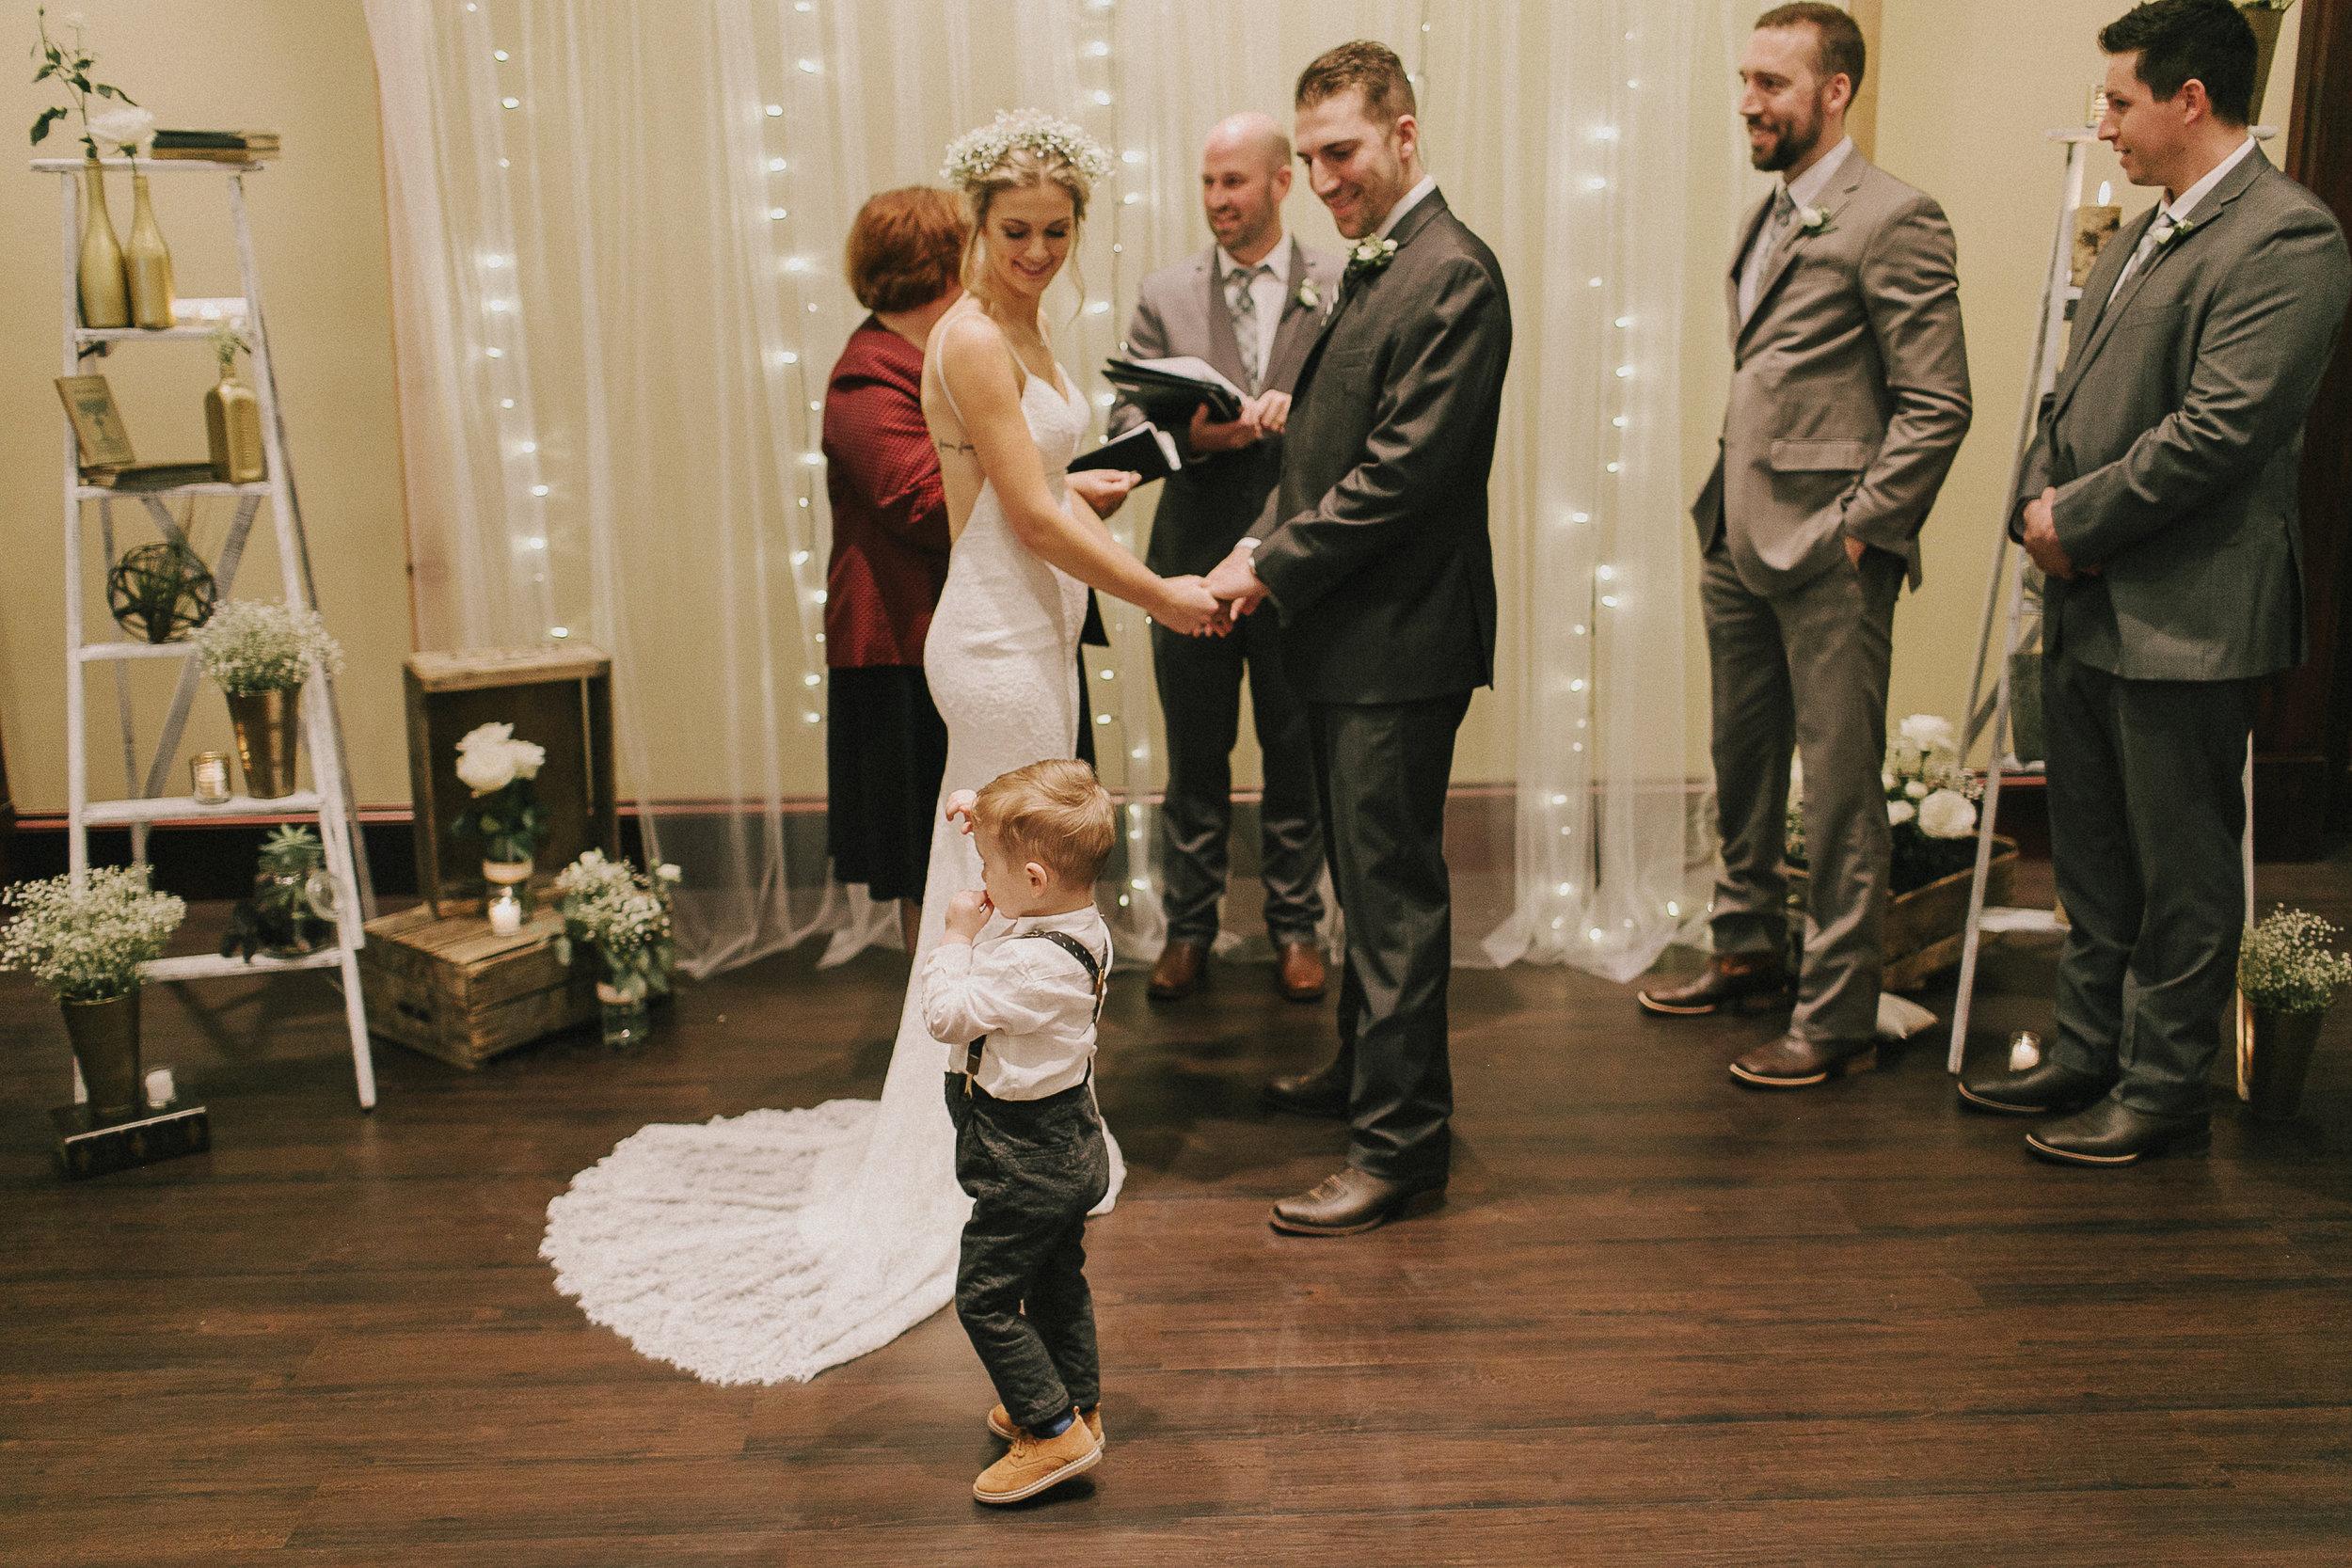 mark-and-liz-wedding-284.jpg